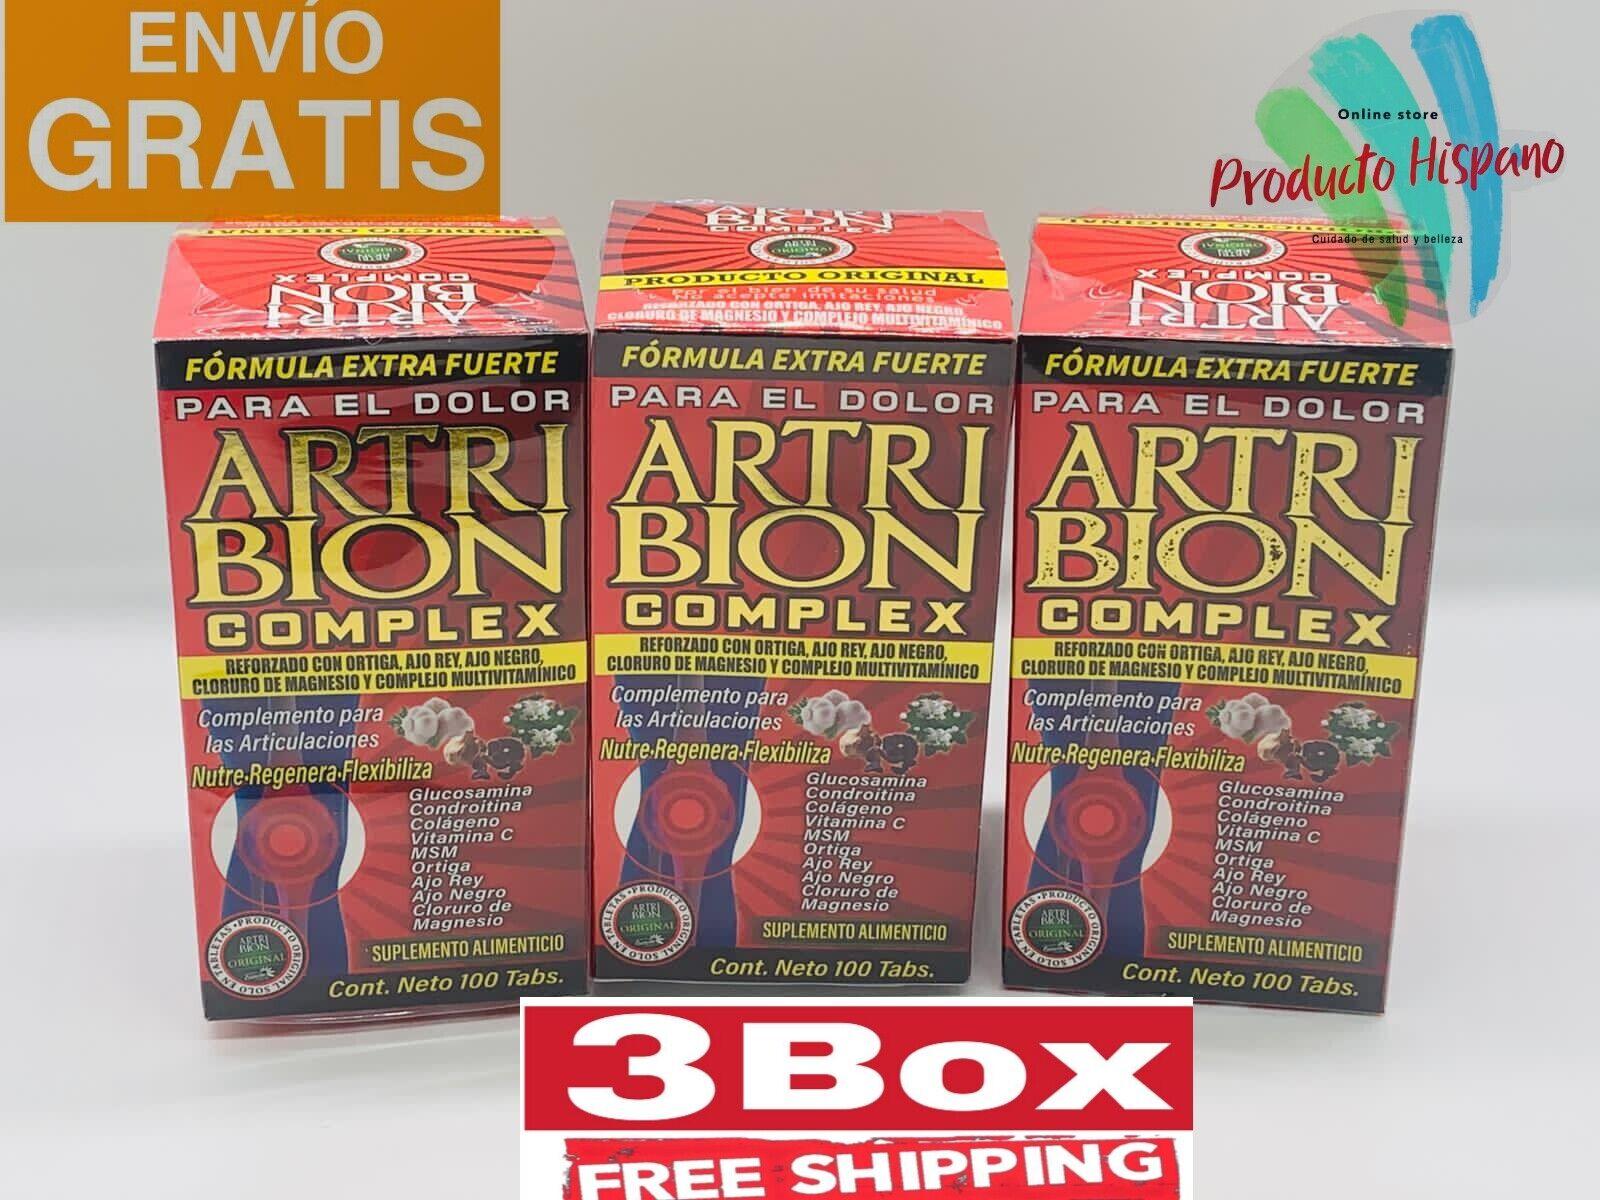 3 BOX ARTRIBION VITAMINADO COMPLEX 300 TABS